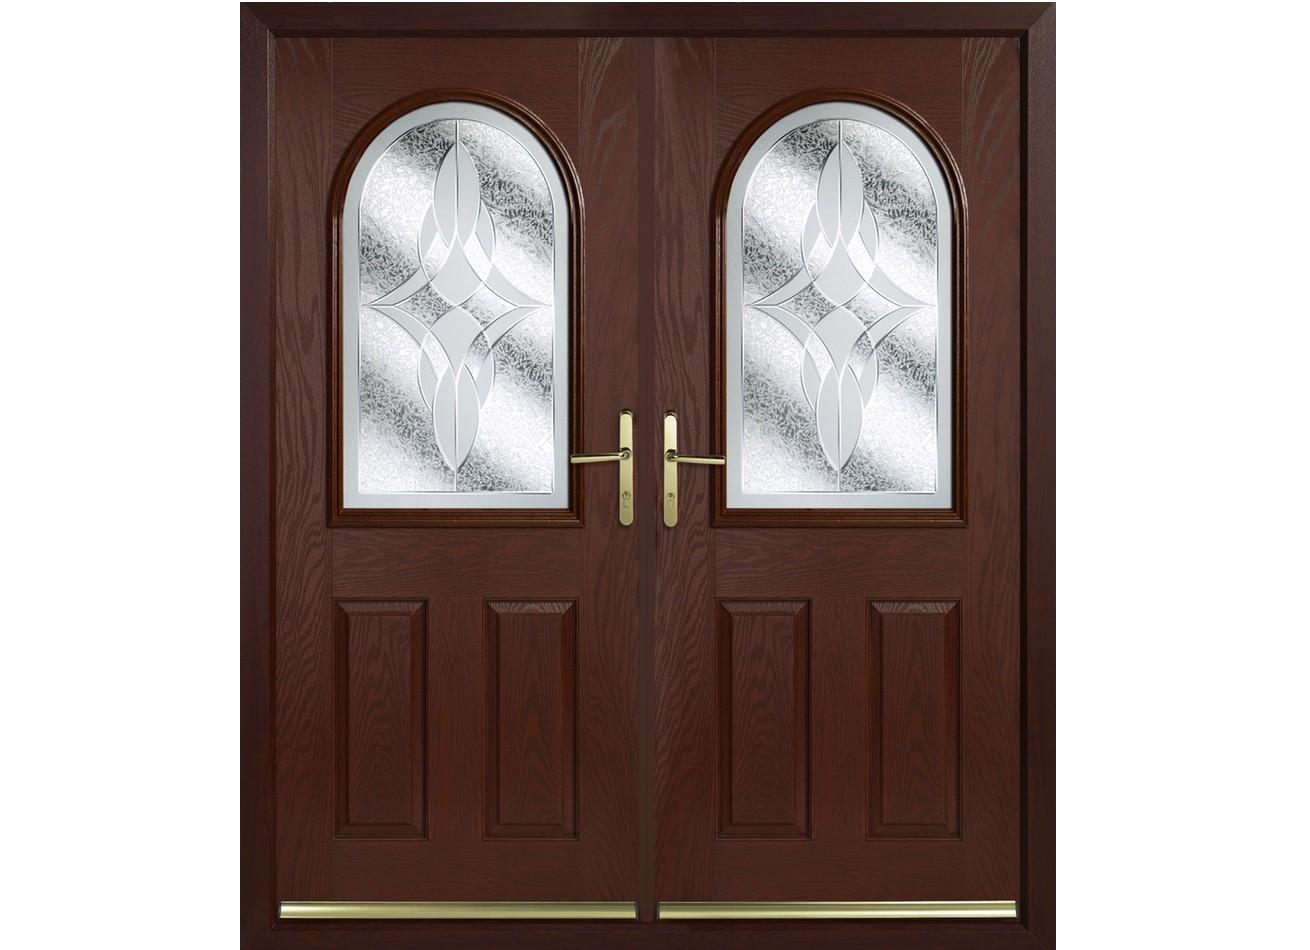 Home Security Elite Windows Amp Conservatories Banbury